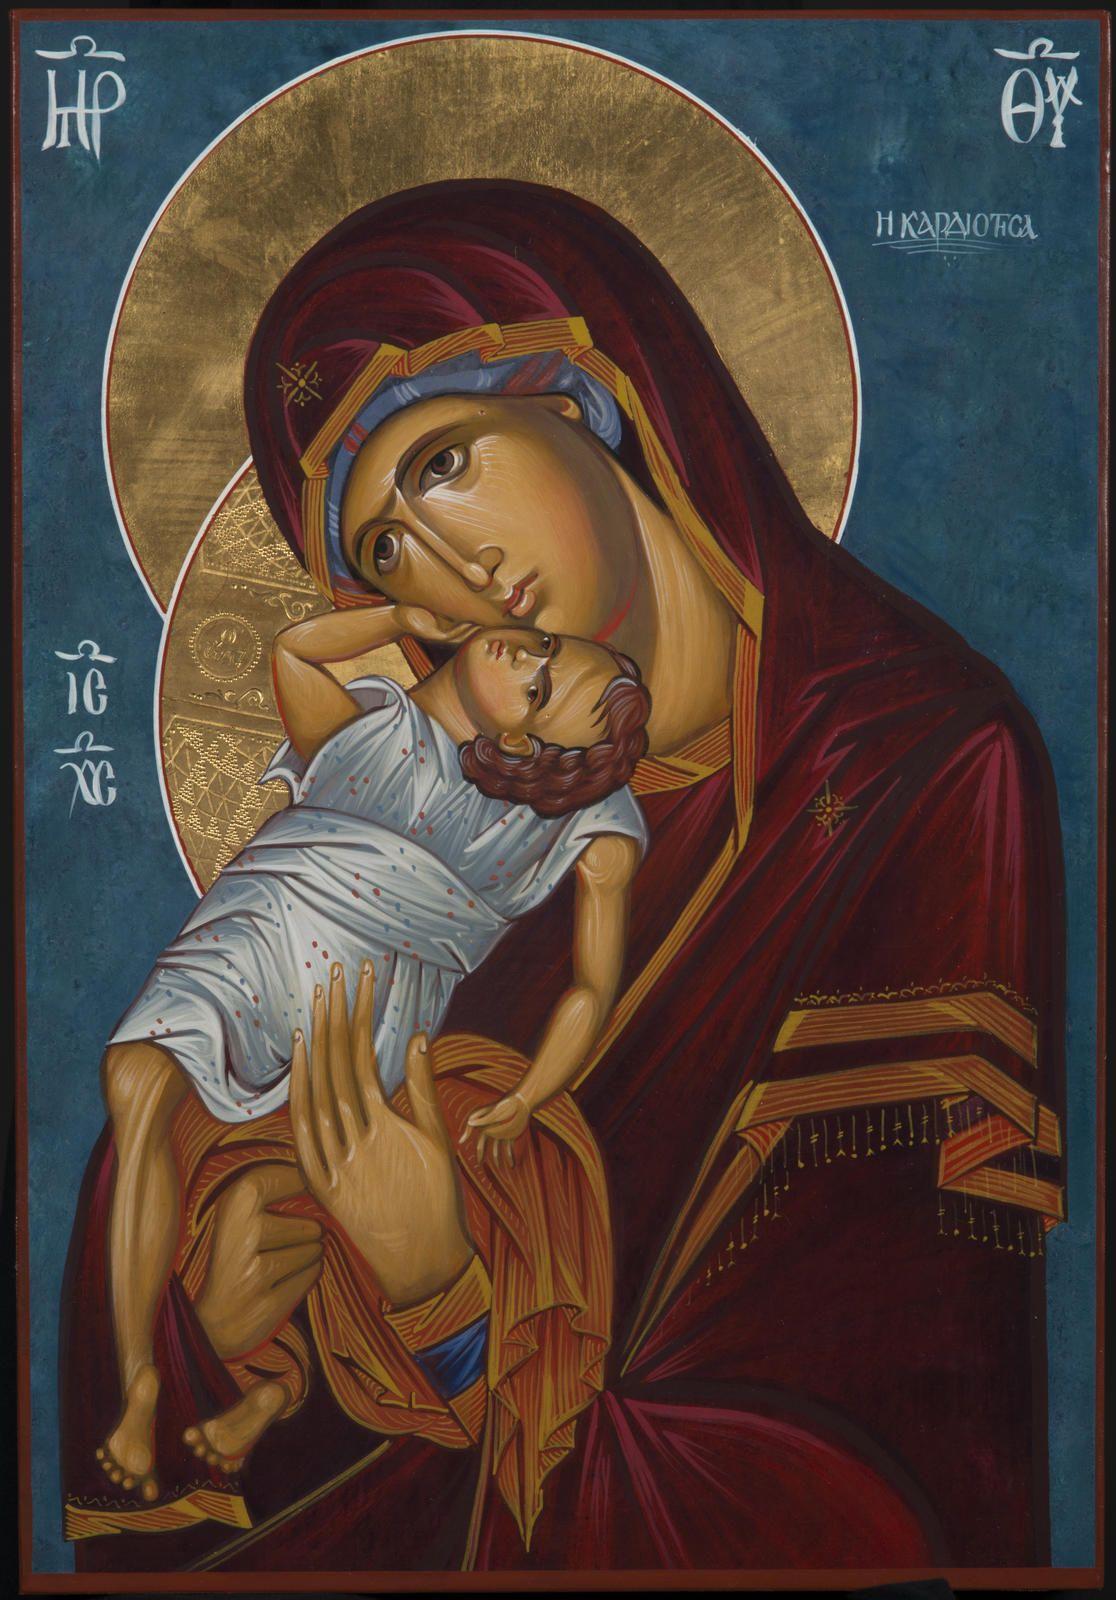 Theotokos by Fr. Damian Higgins